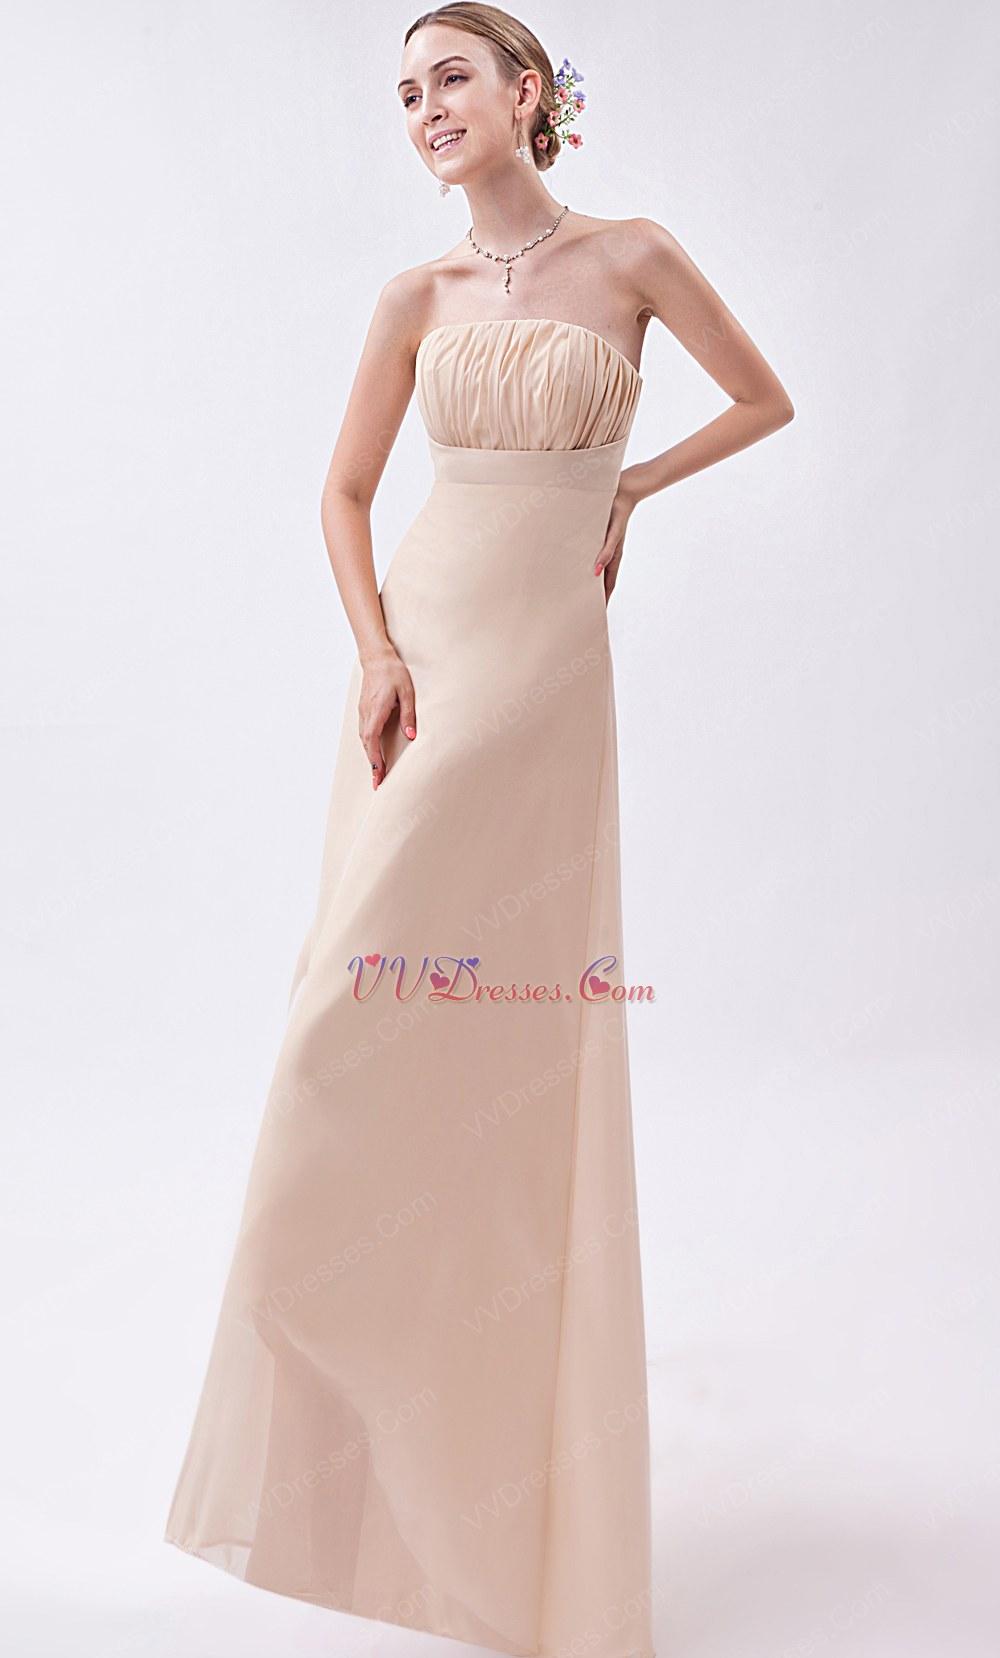 champagne color wedding dresses reviews champagne colored wedding dress Champagne Color Wedding Dresses Reviews